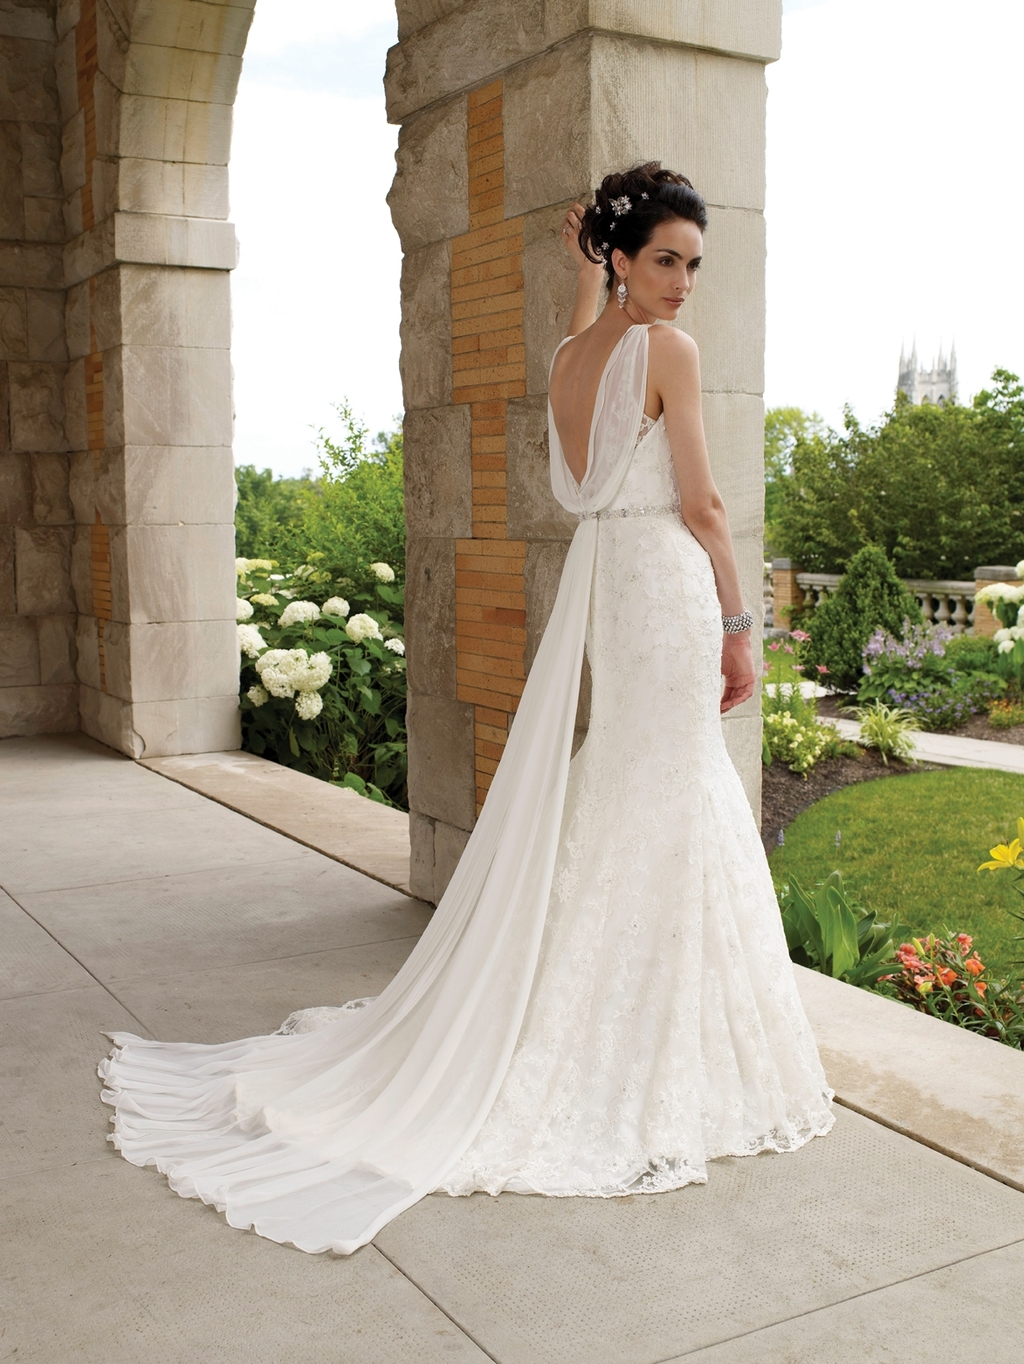 111207-spring-2011-wedding-dress-mon-cheri-high-lace-neck-mermaid-back.full